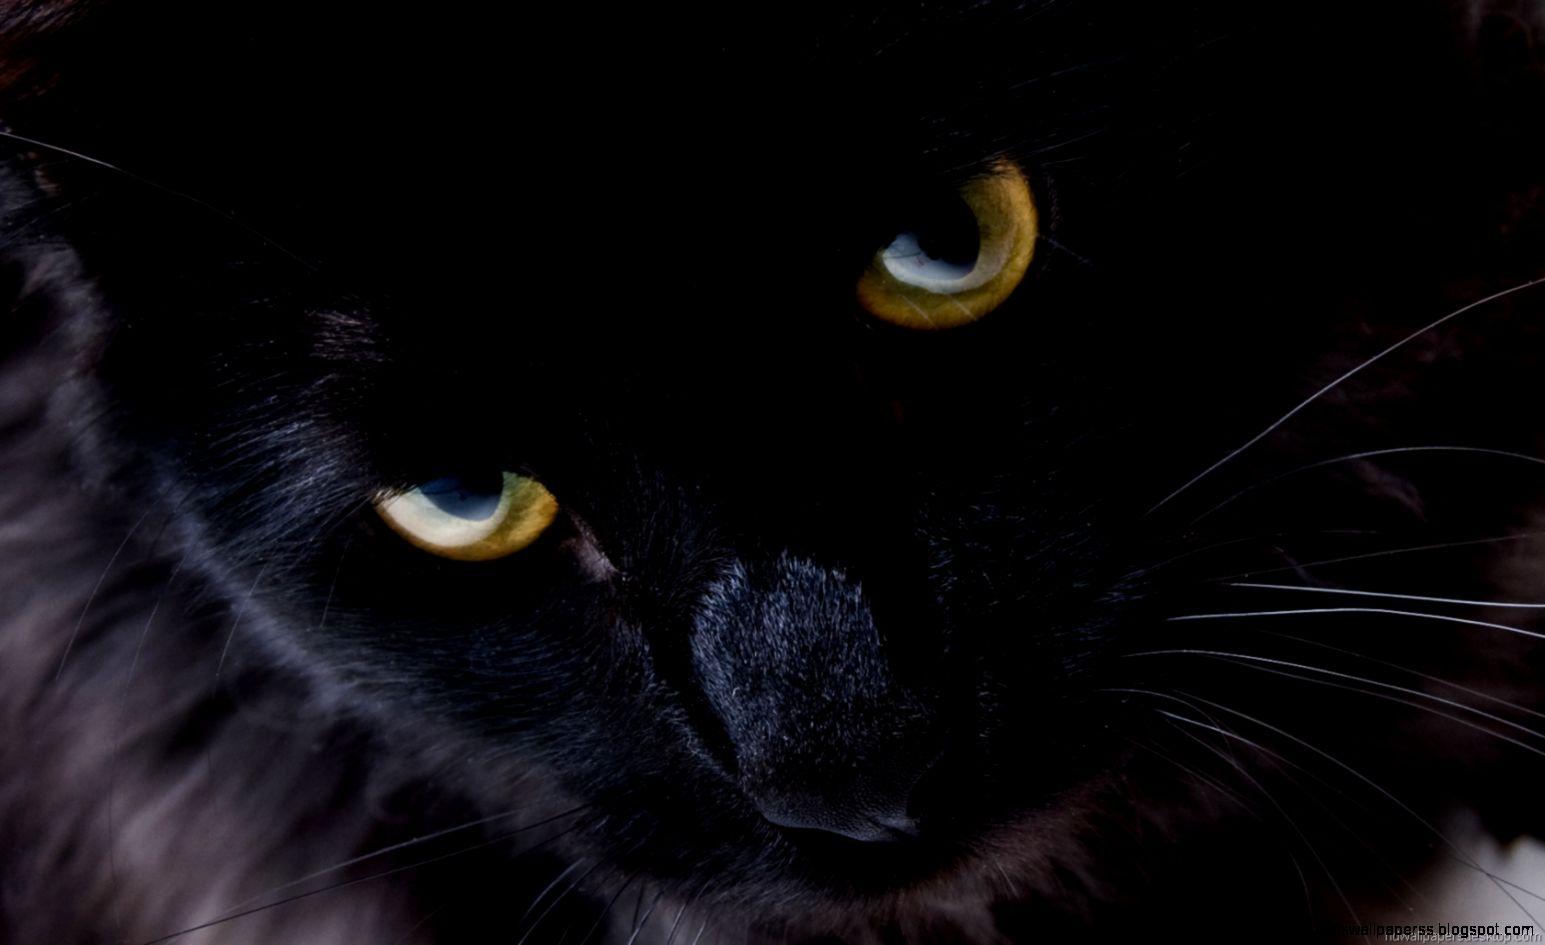 Black Cat Hd Wallpaper Widescreen | High Definitions ...